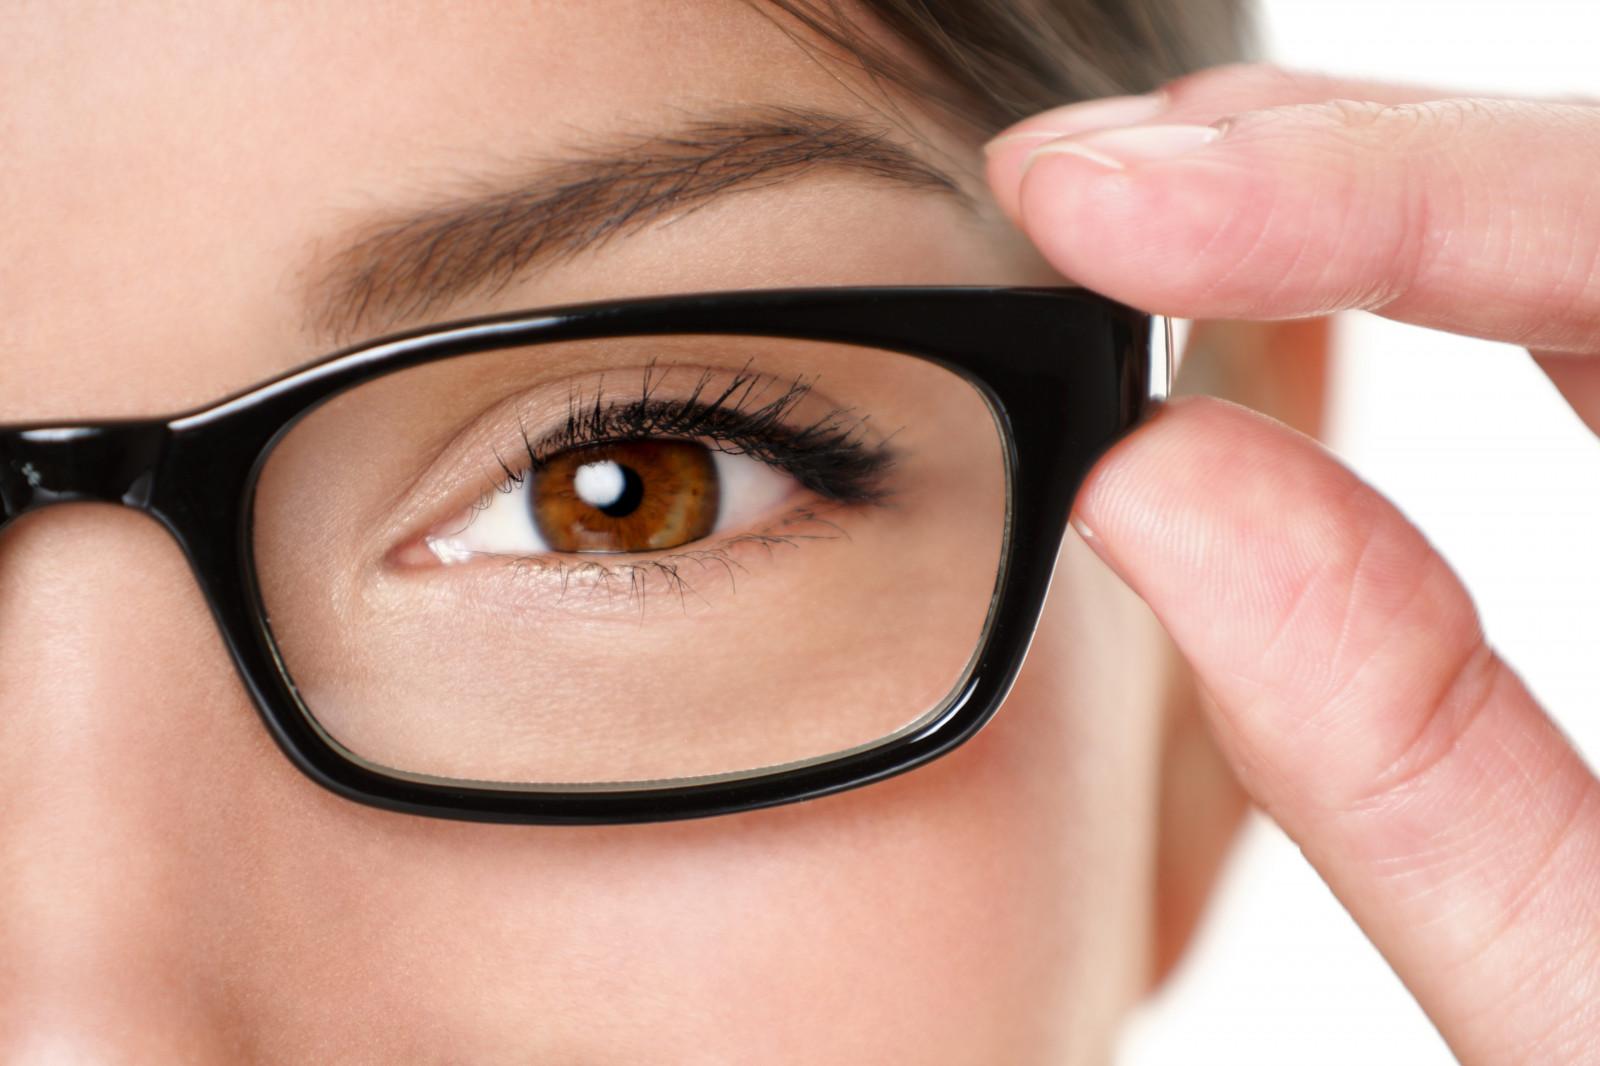 фото очки и глаза